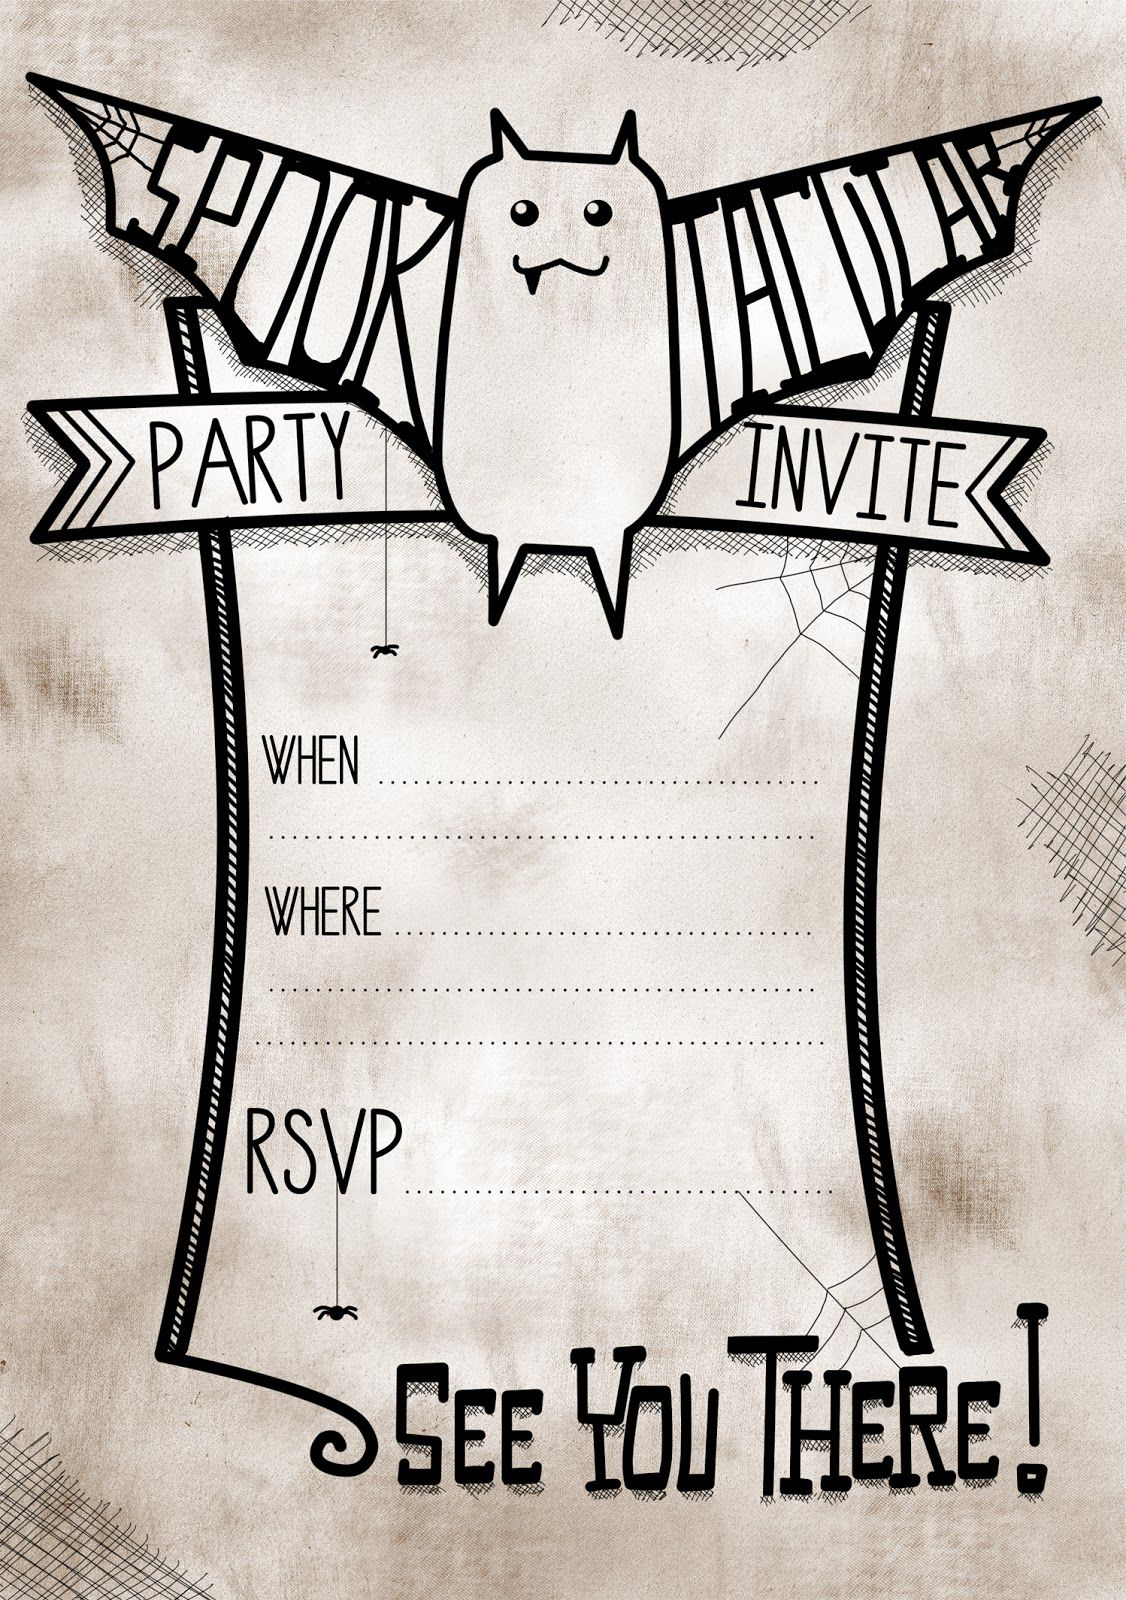 Cute Halloween Spooktacular Party Invites Free Halloween Party Invitations Printable Halloween Party Invitations Free Printable Halloween Party Invitations